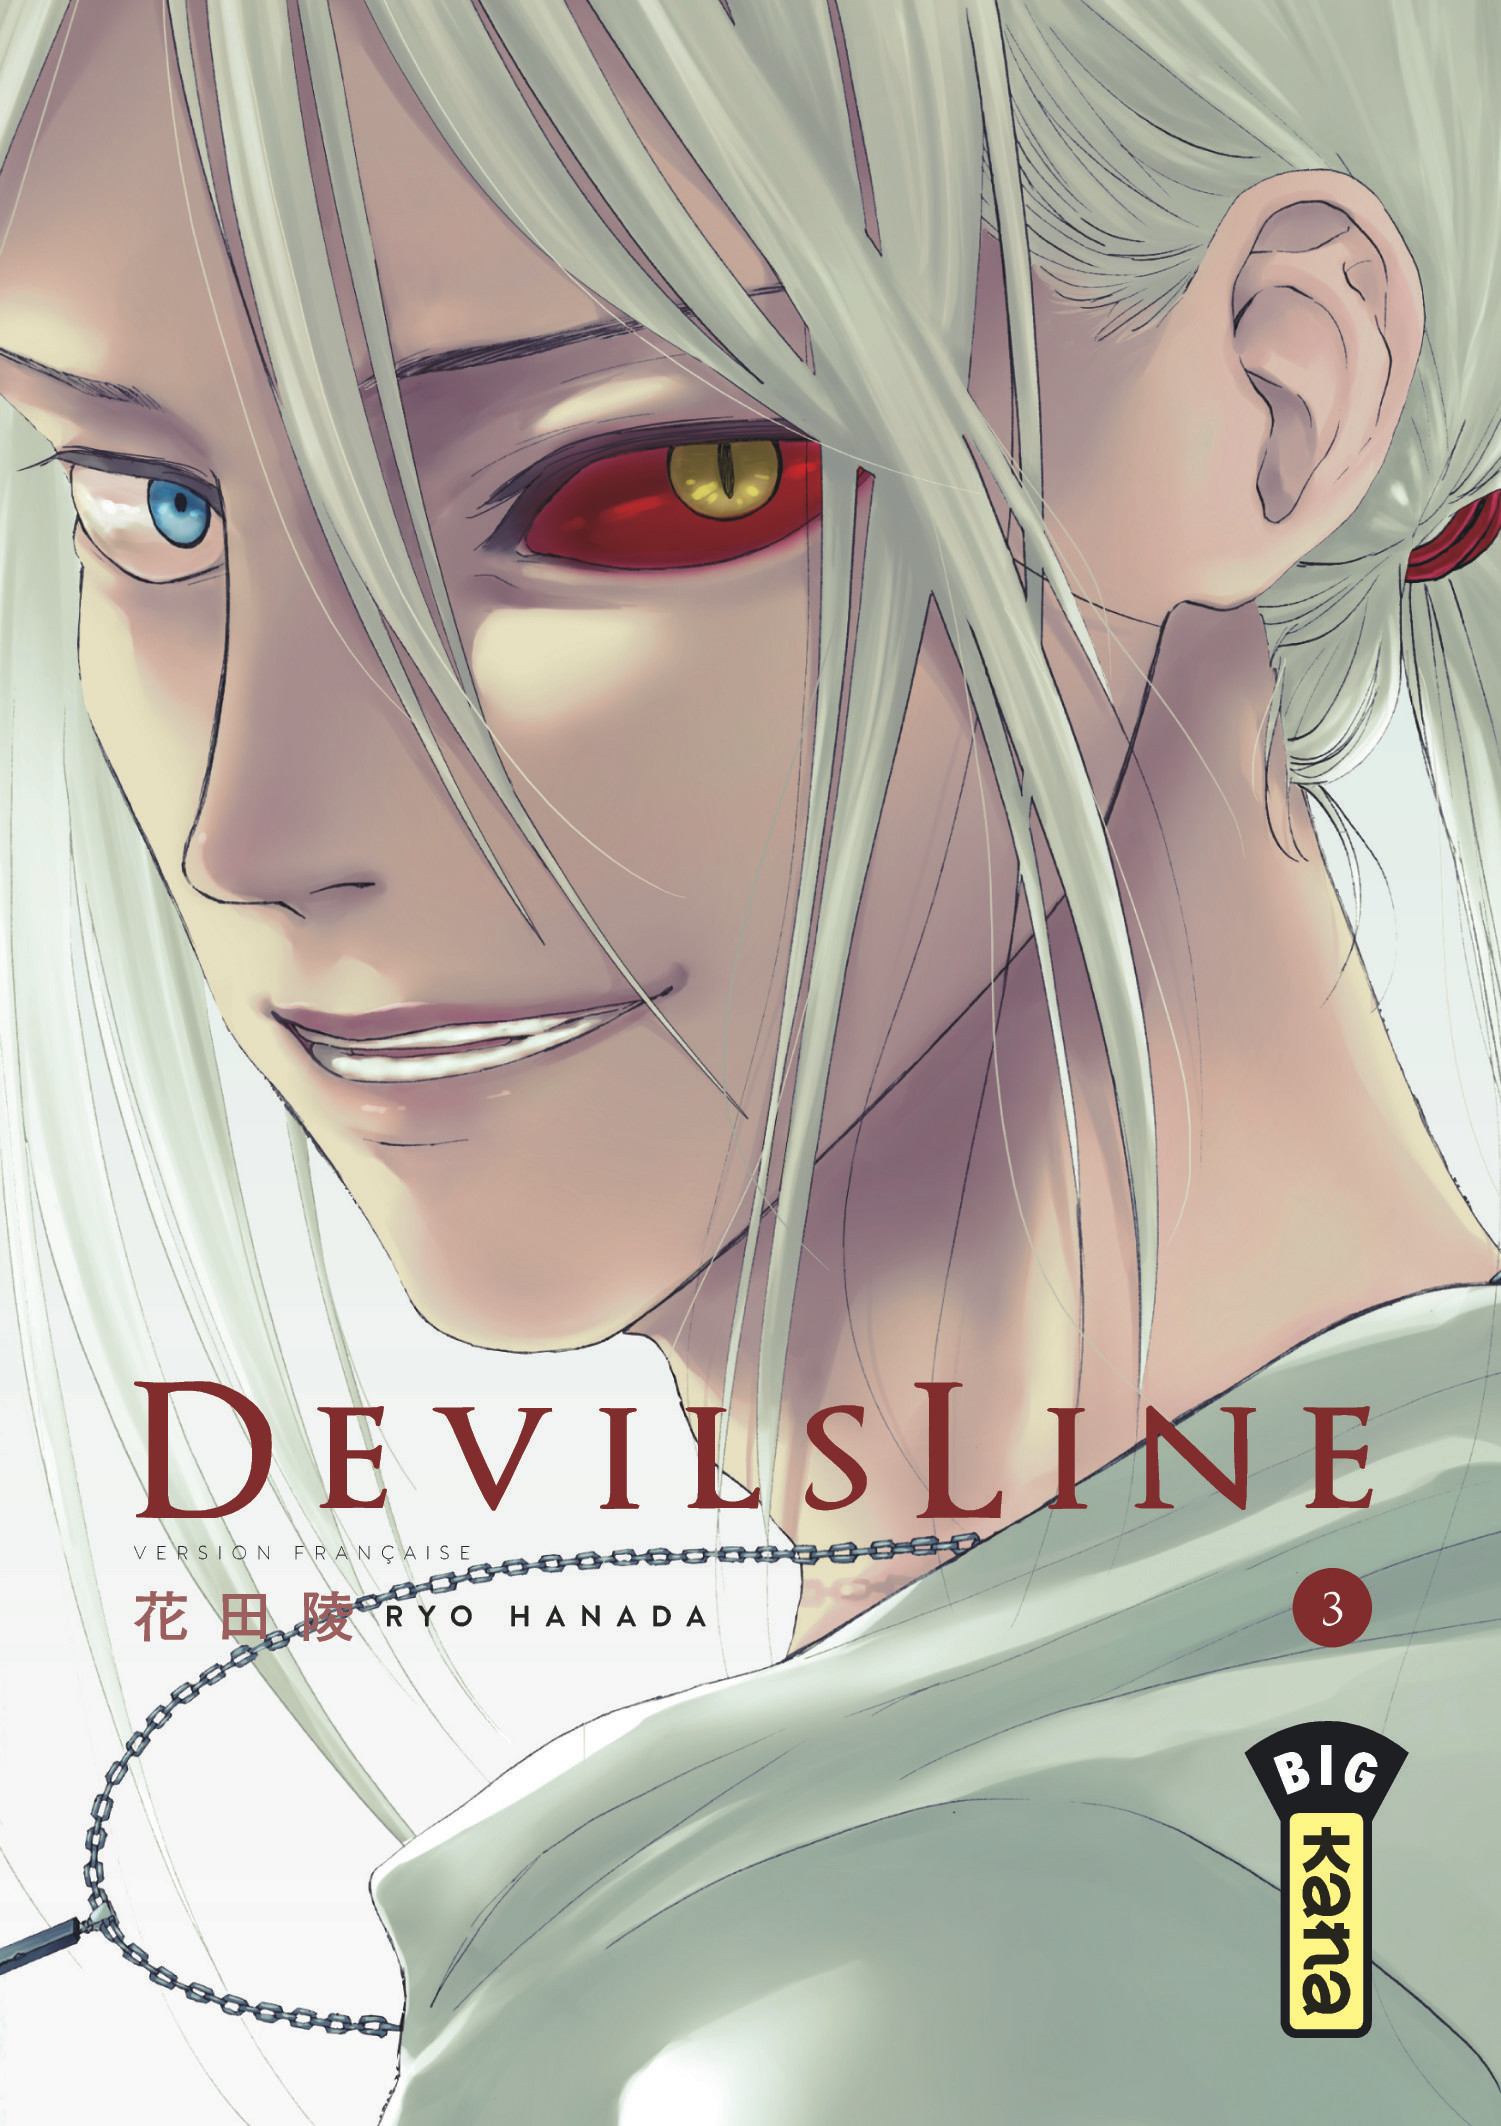 [ MANGA / ANIME ] Devil's Line // DevilsLine Devilsline-manga-volume-3-simple-232312